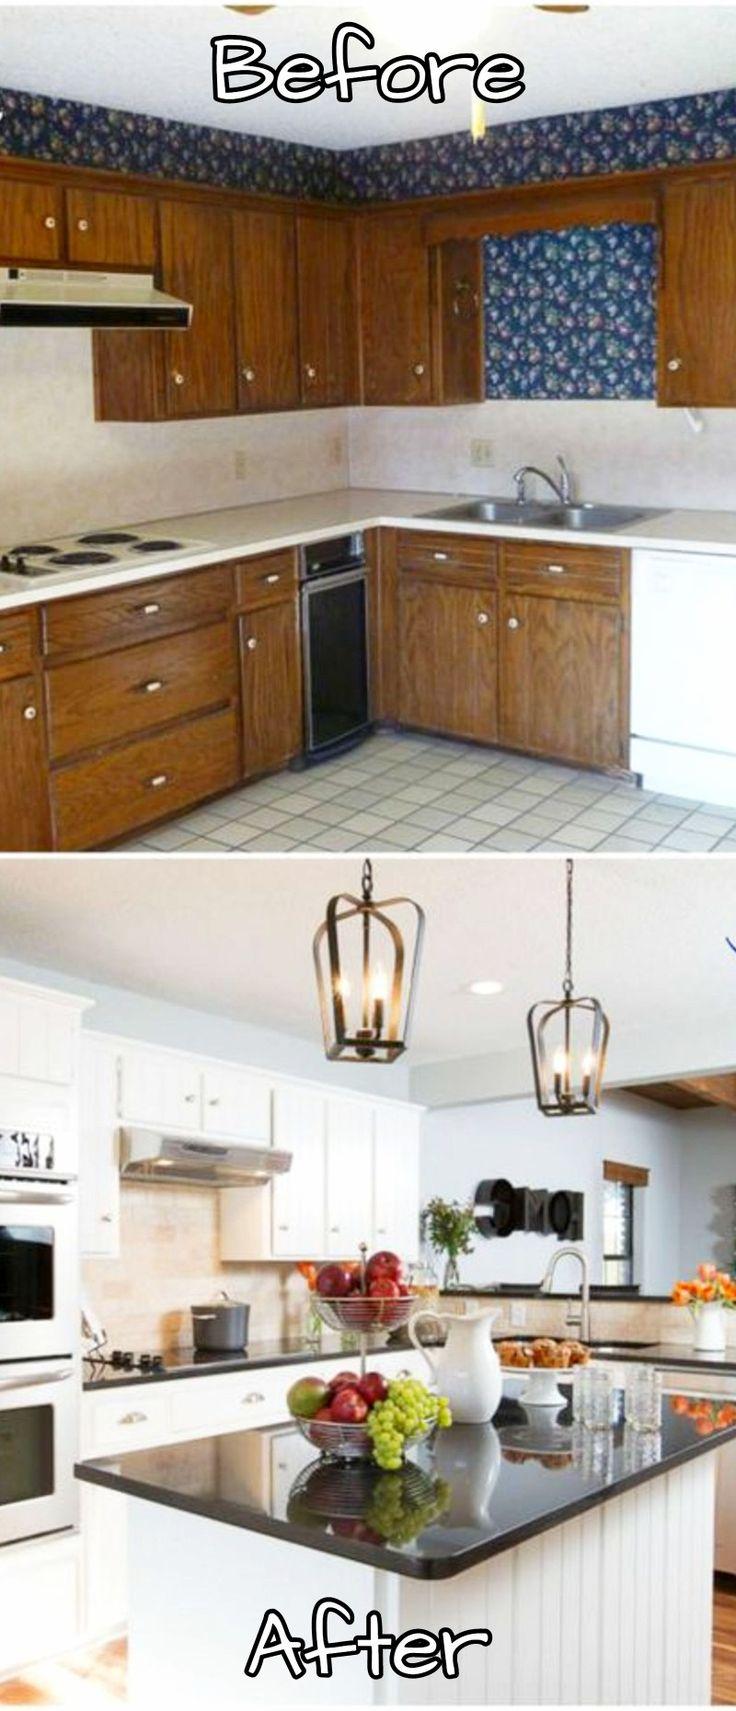 102 Best Kitchen Remodeling • Kitchen Makeovers Images On